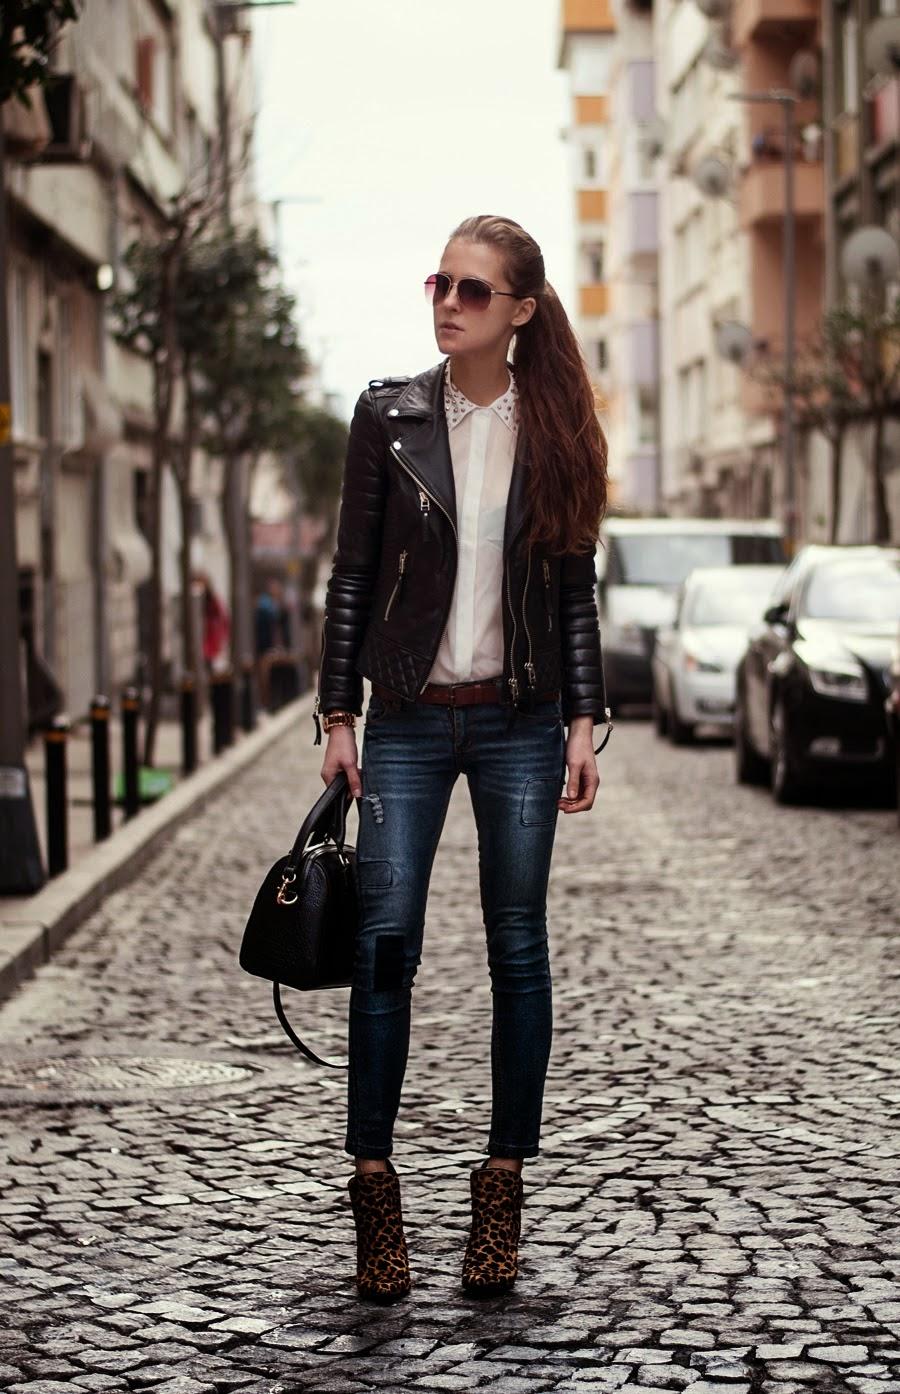 Leather jackets, white shirt, skinnies and cheetah print high heels